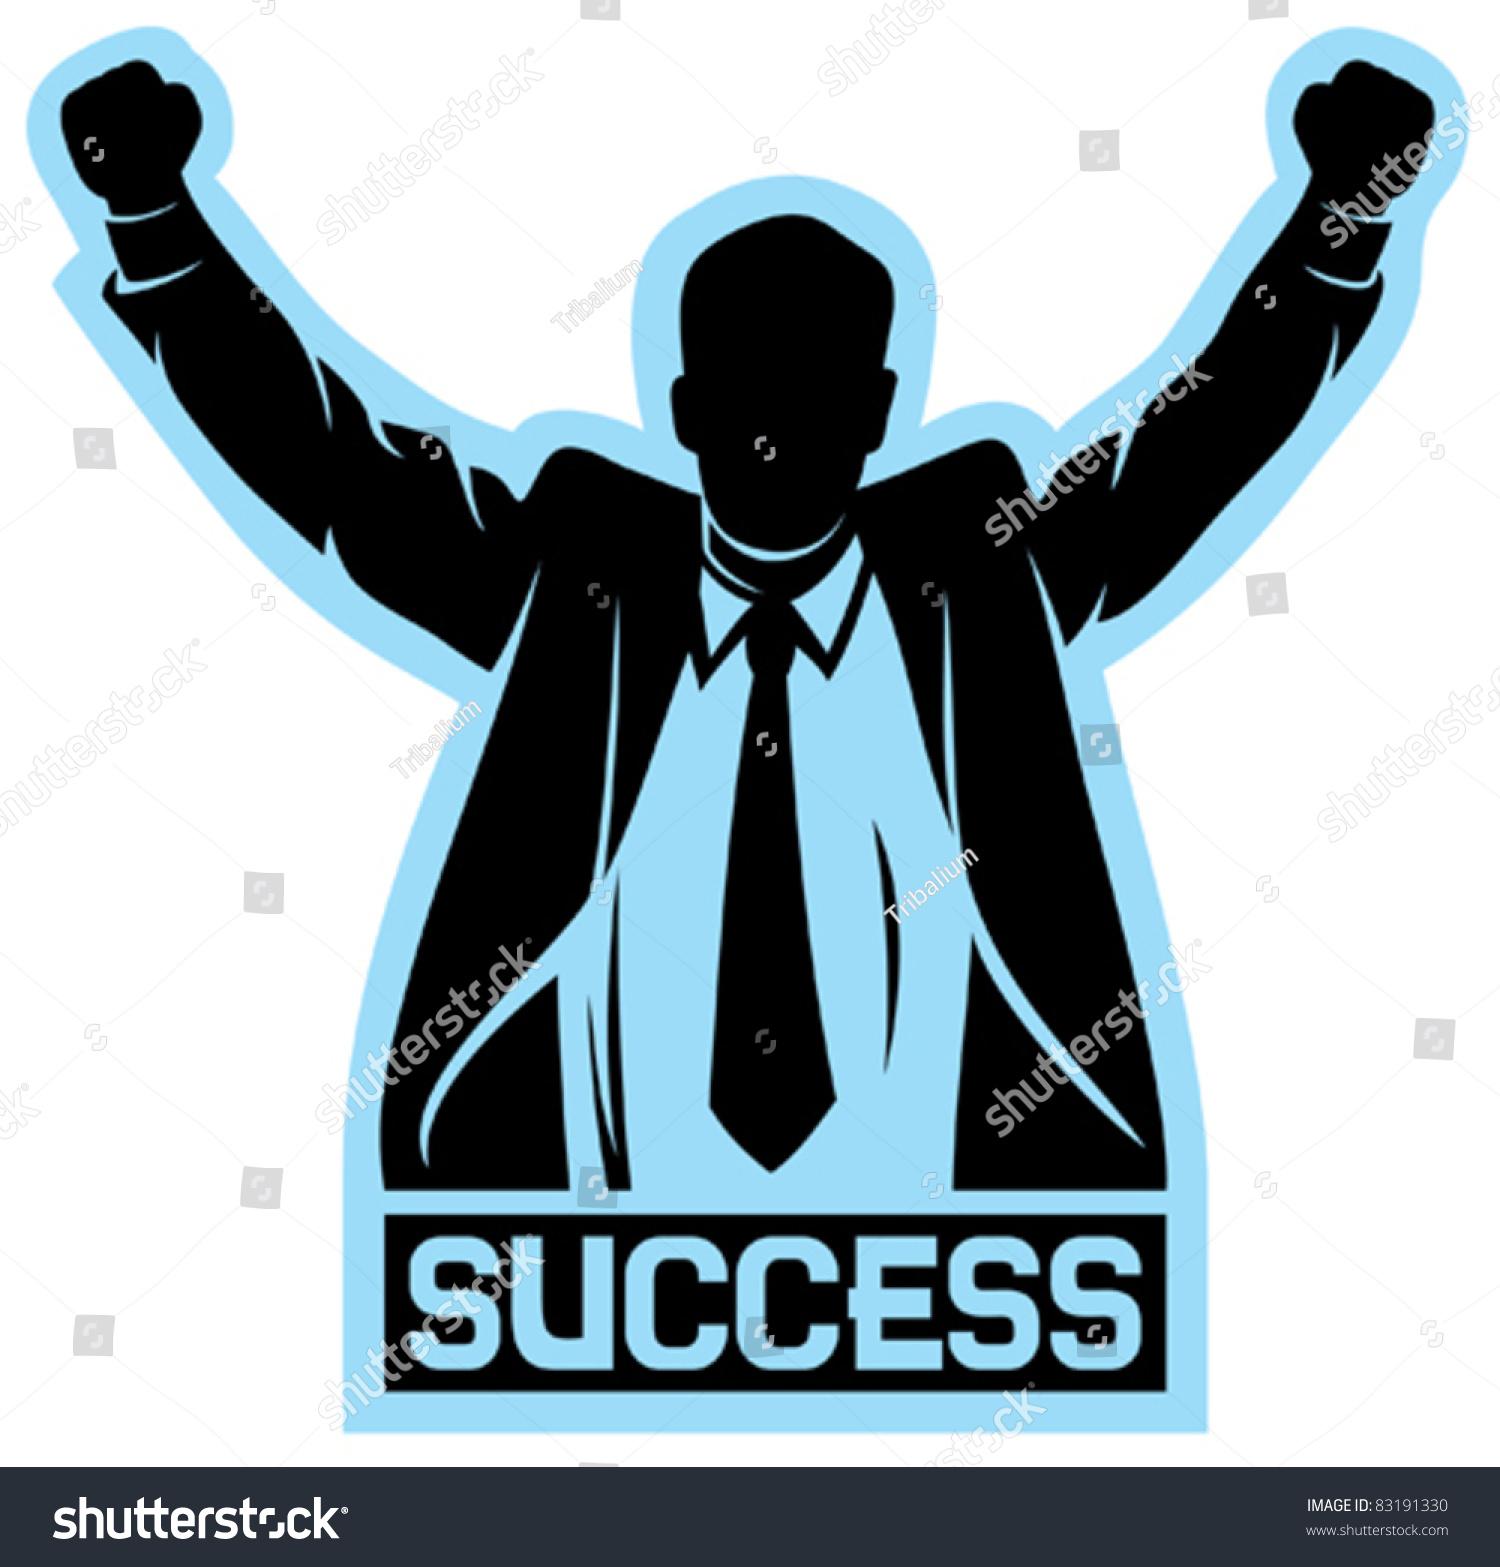 successful businessman stock vector shutterstock successful businessman